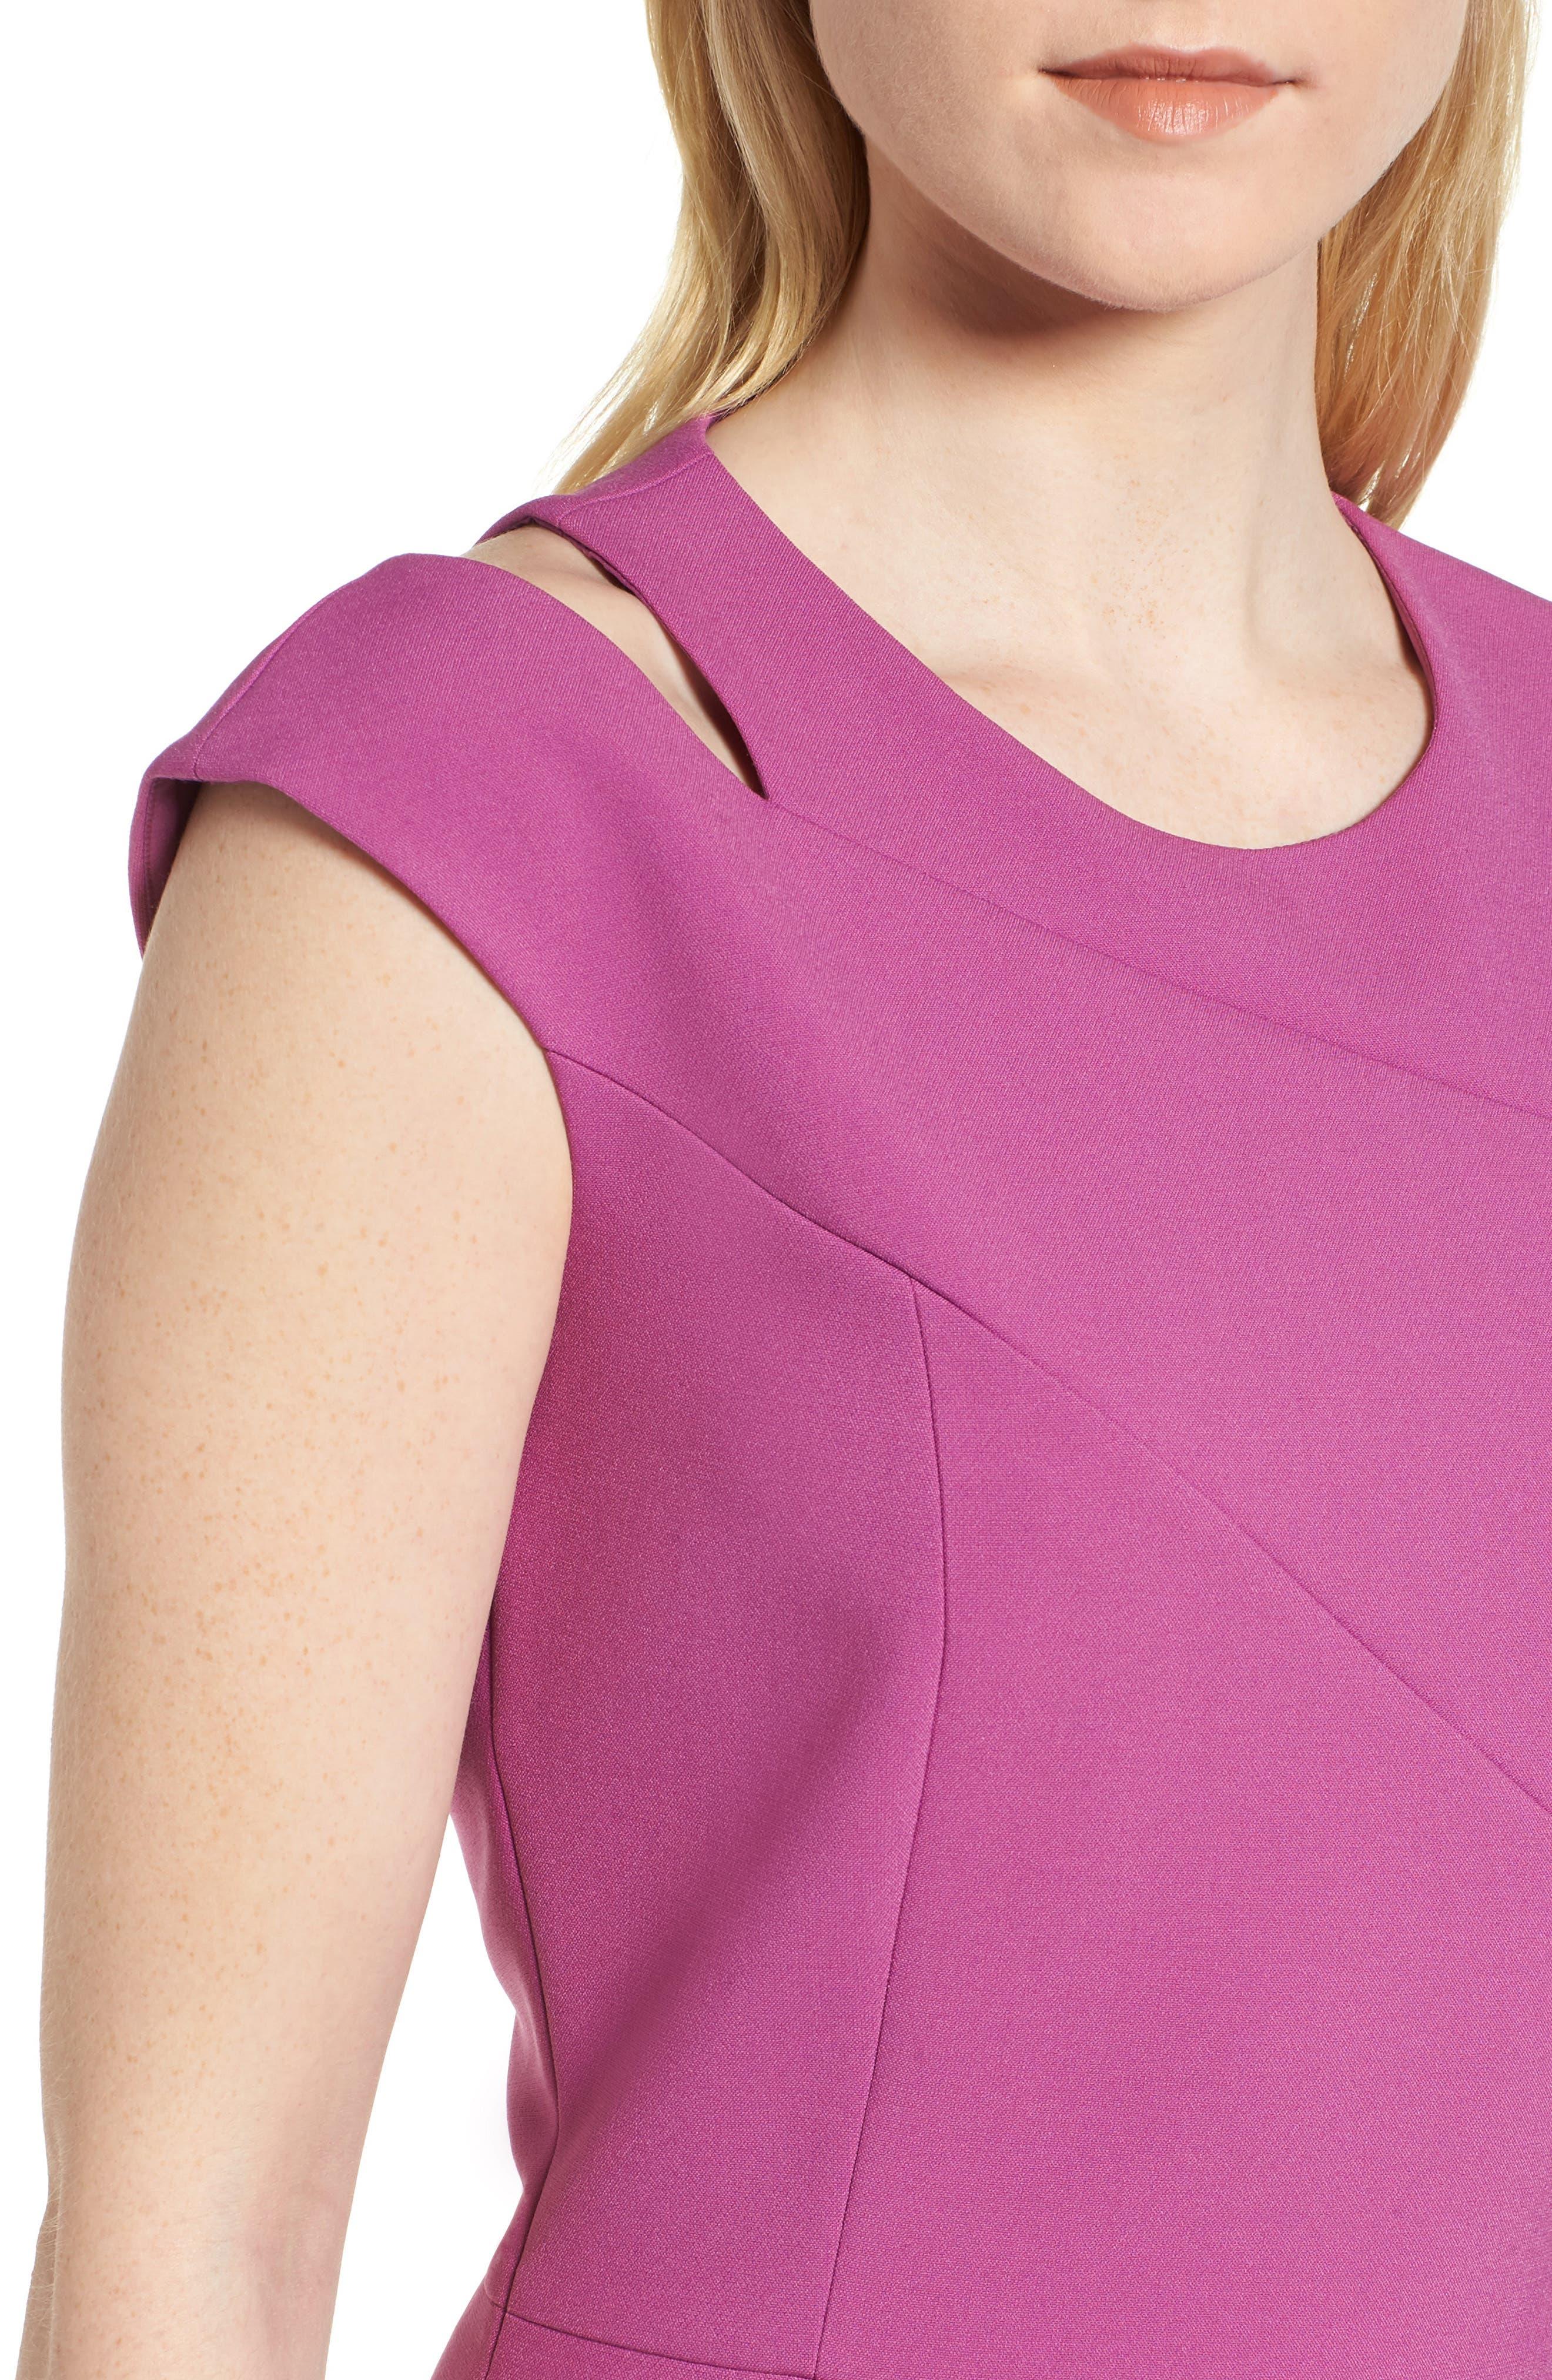 Danouk Ponte Sheath Dress,                             Alternate thumbnail 4, color,                             511